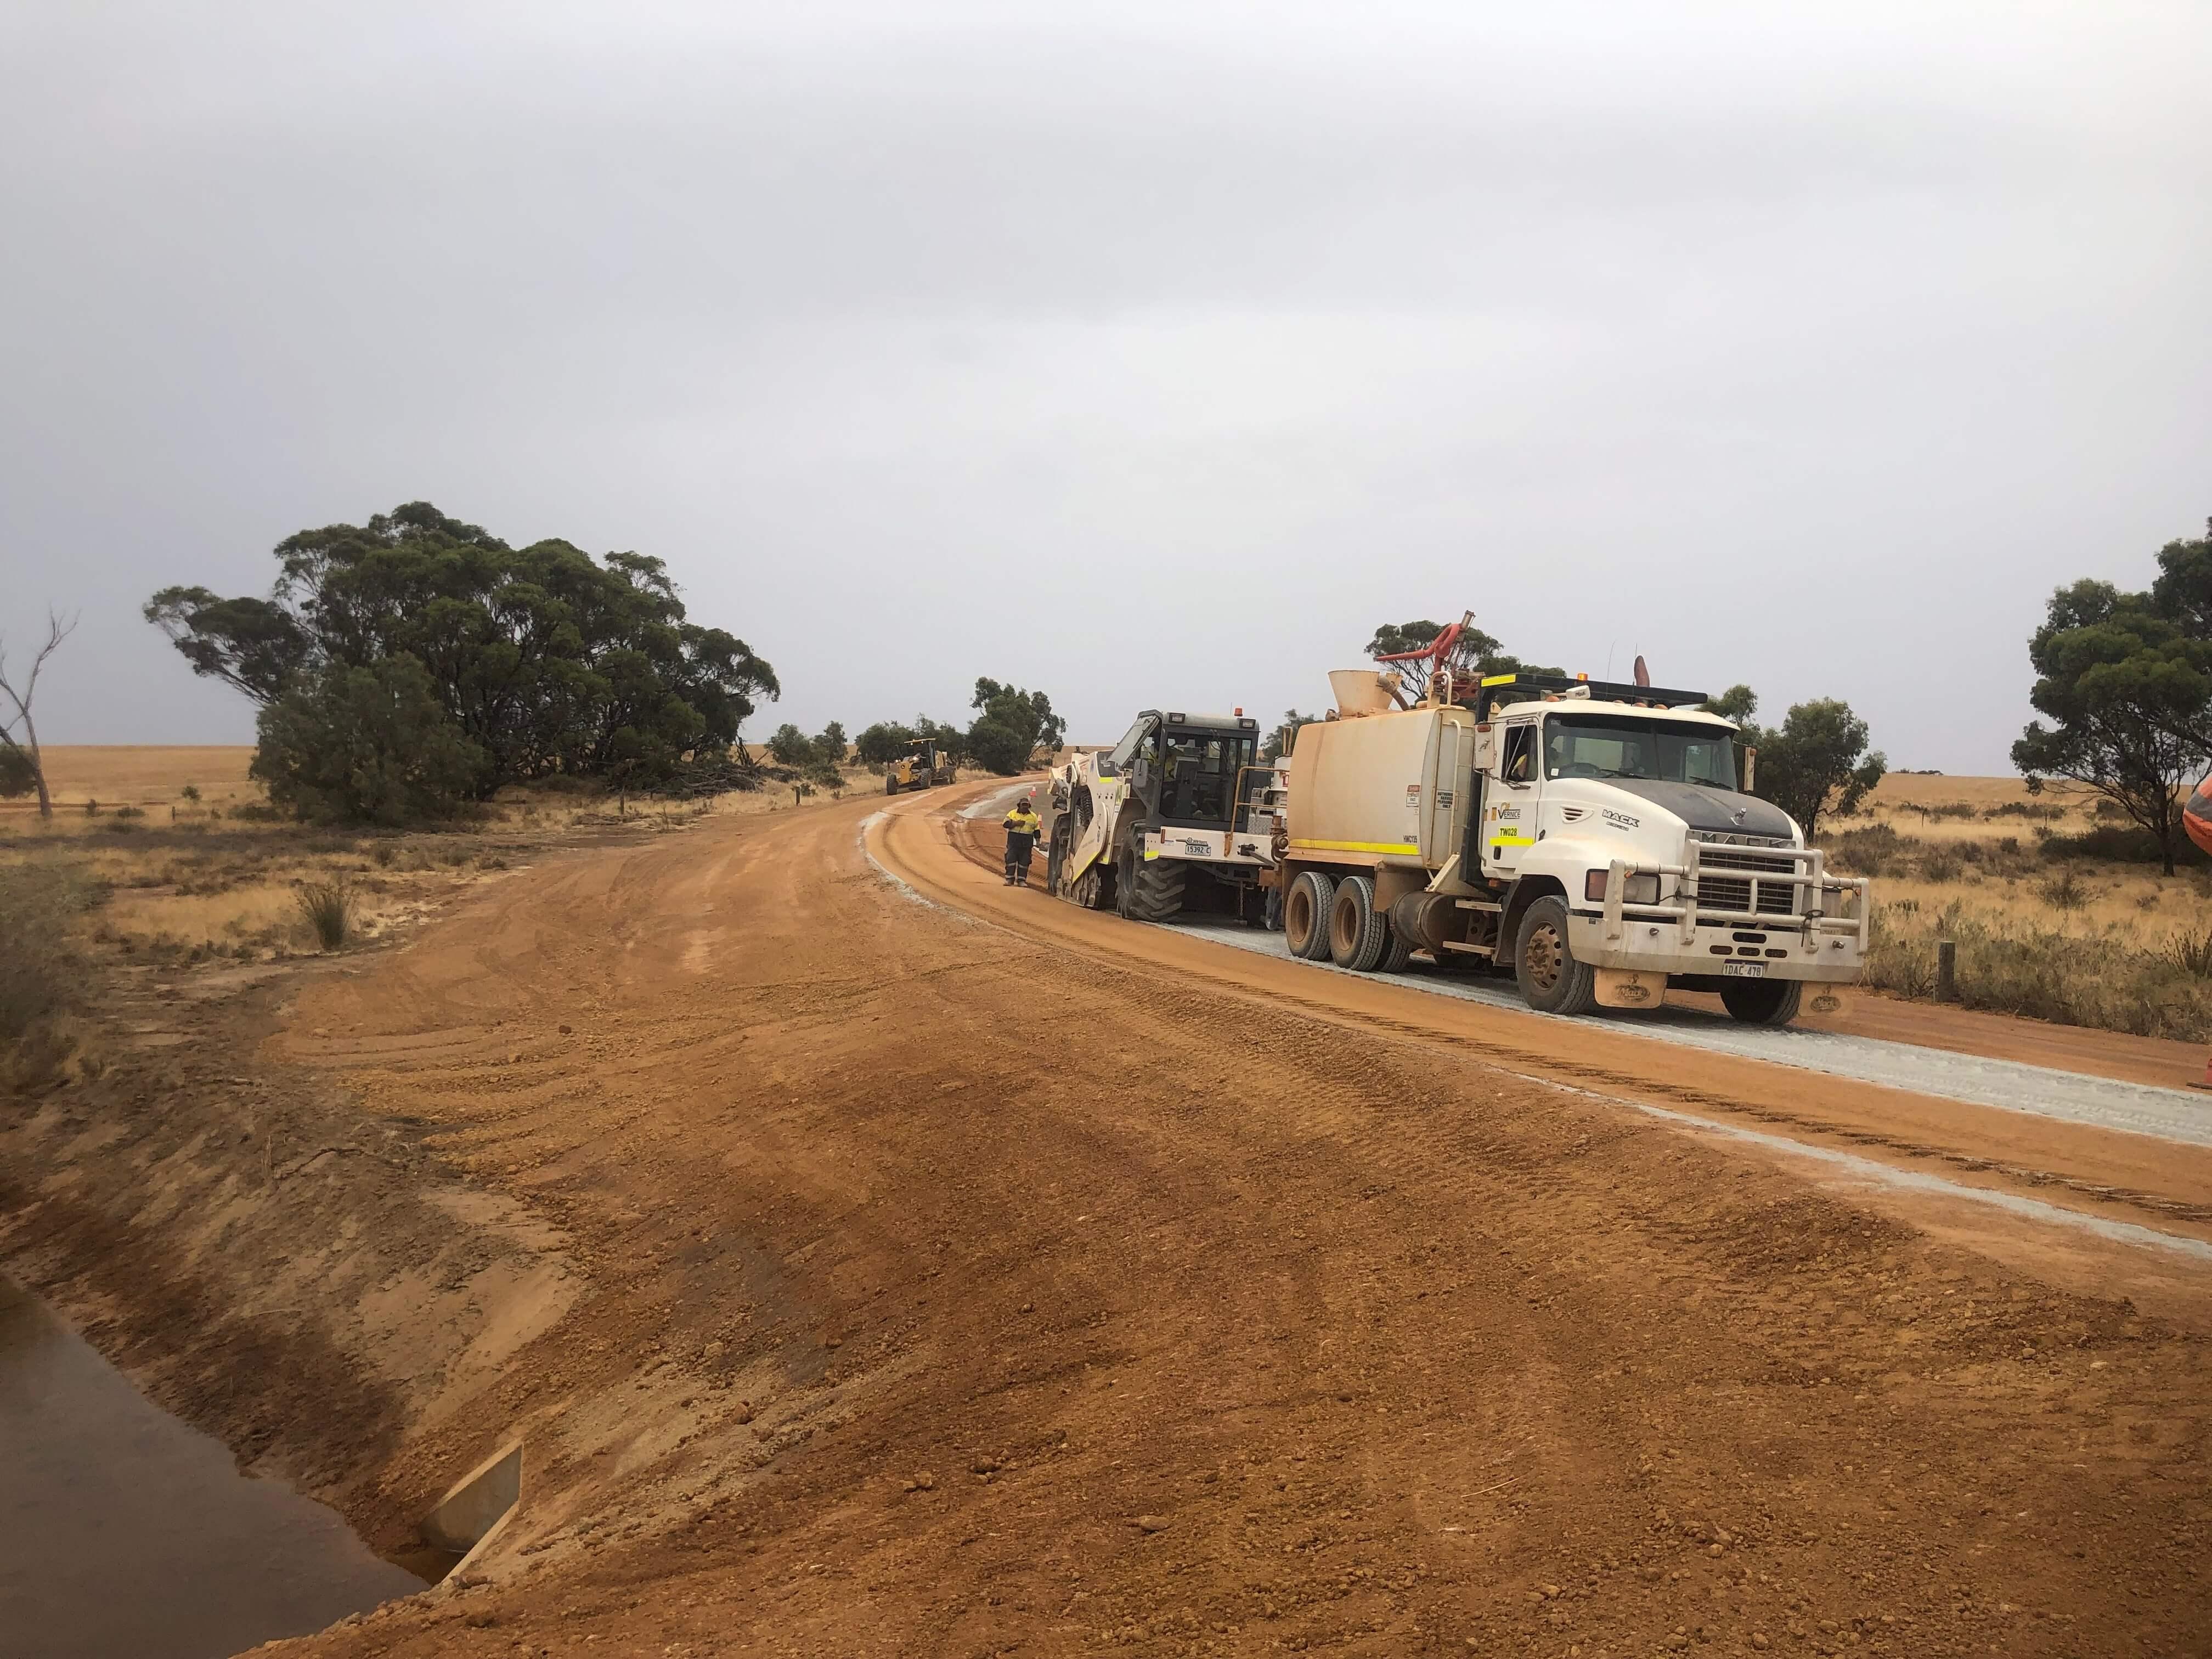 vernice-10000L-water-cart-hire-perth-western-australia